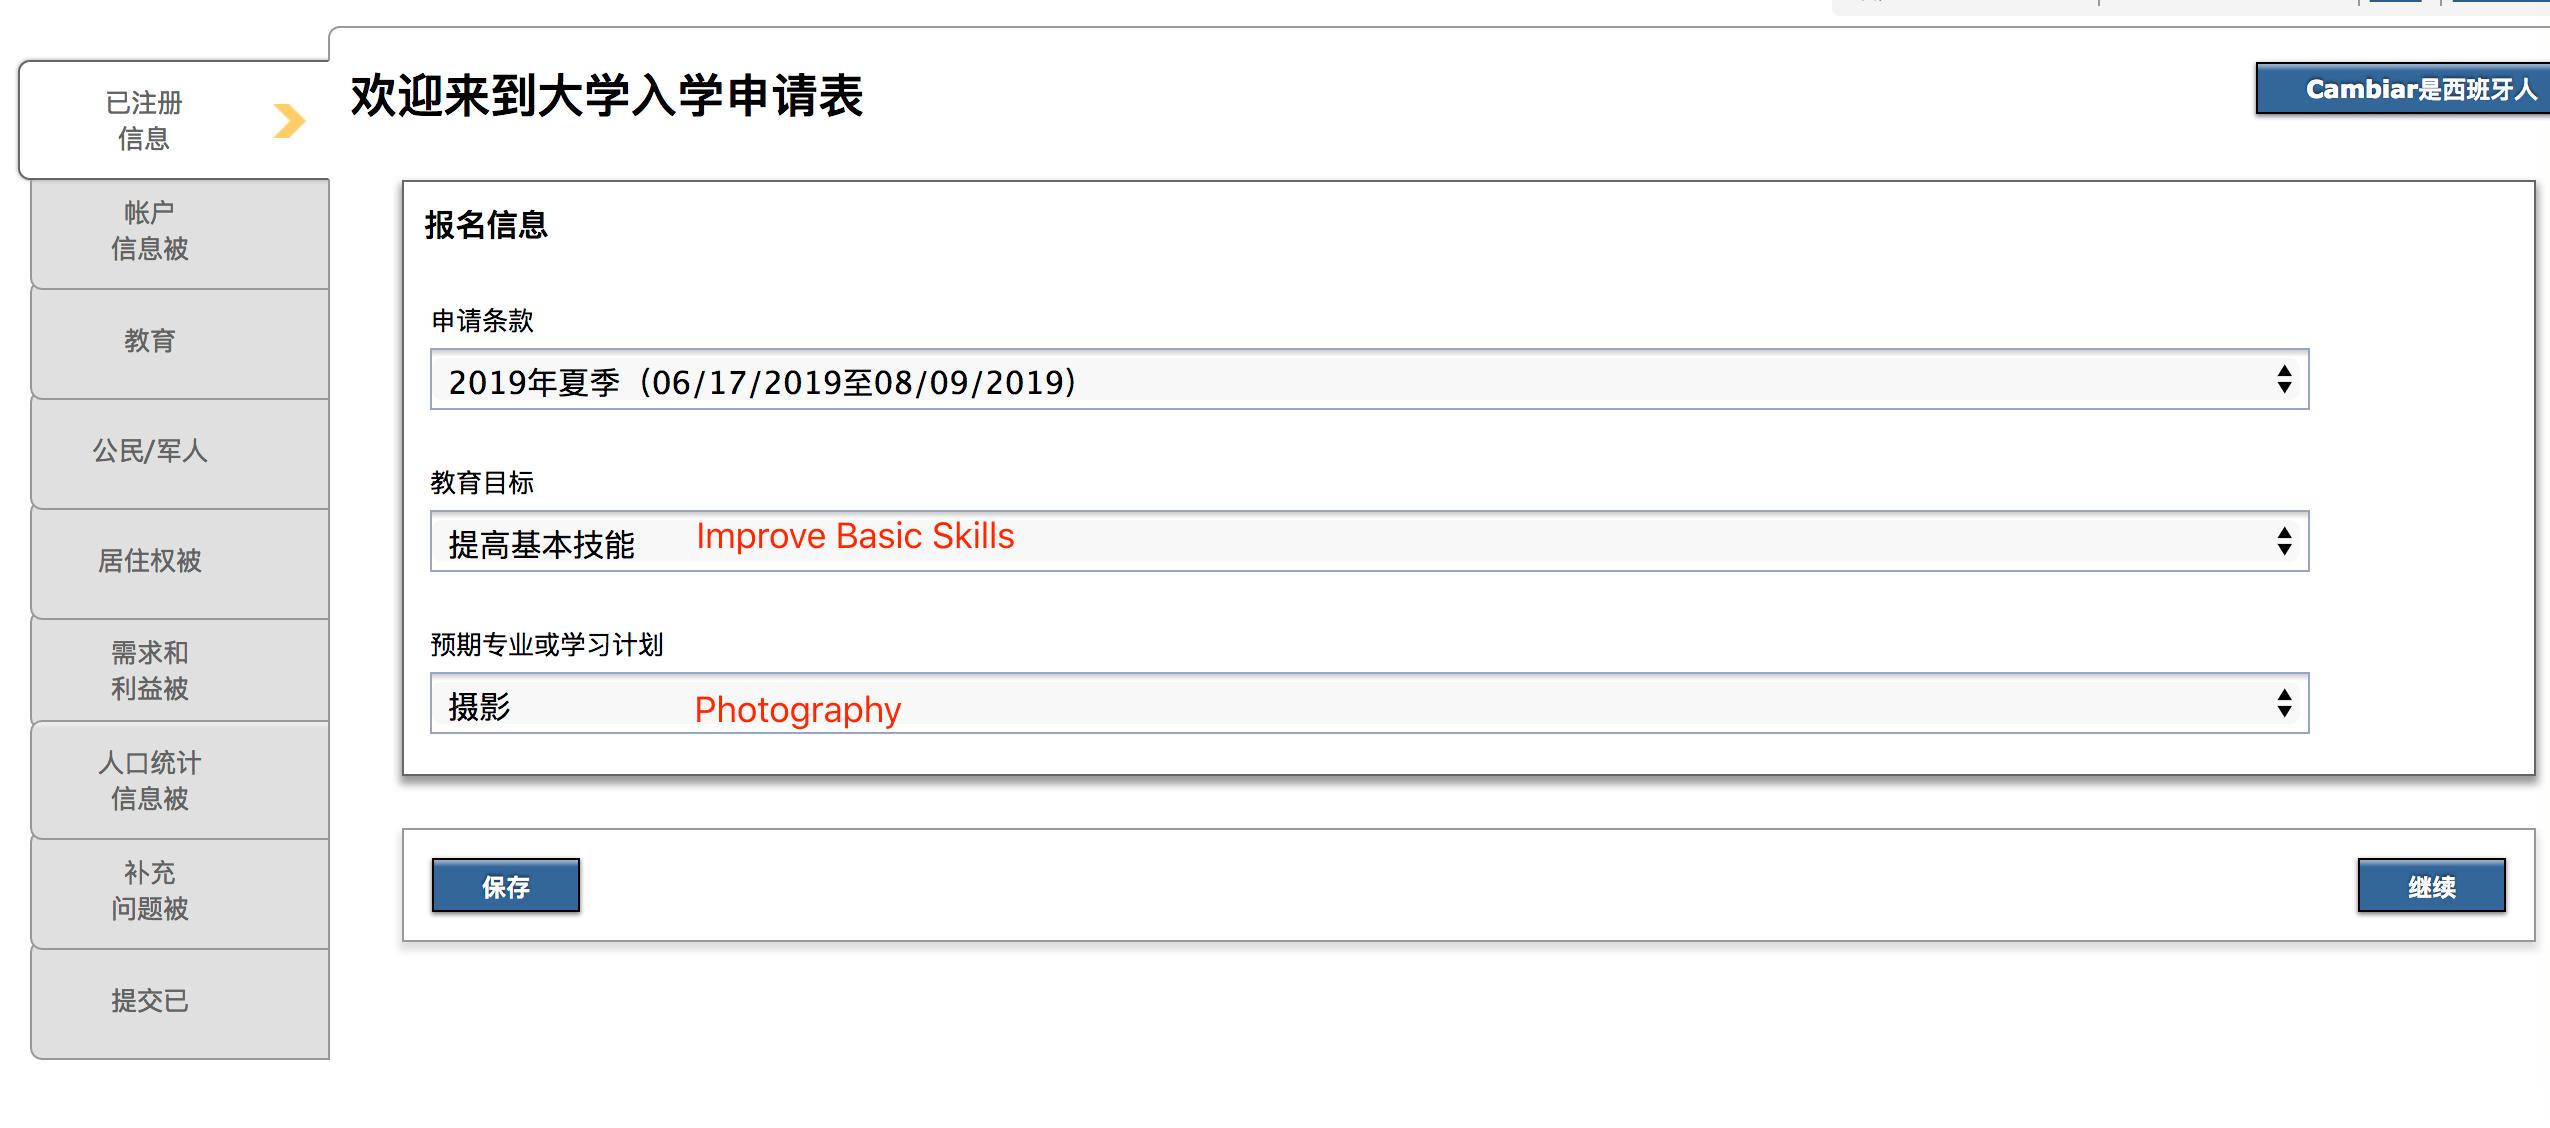 报名信息.png